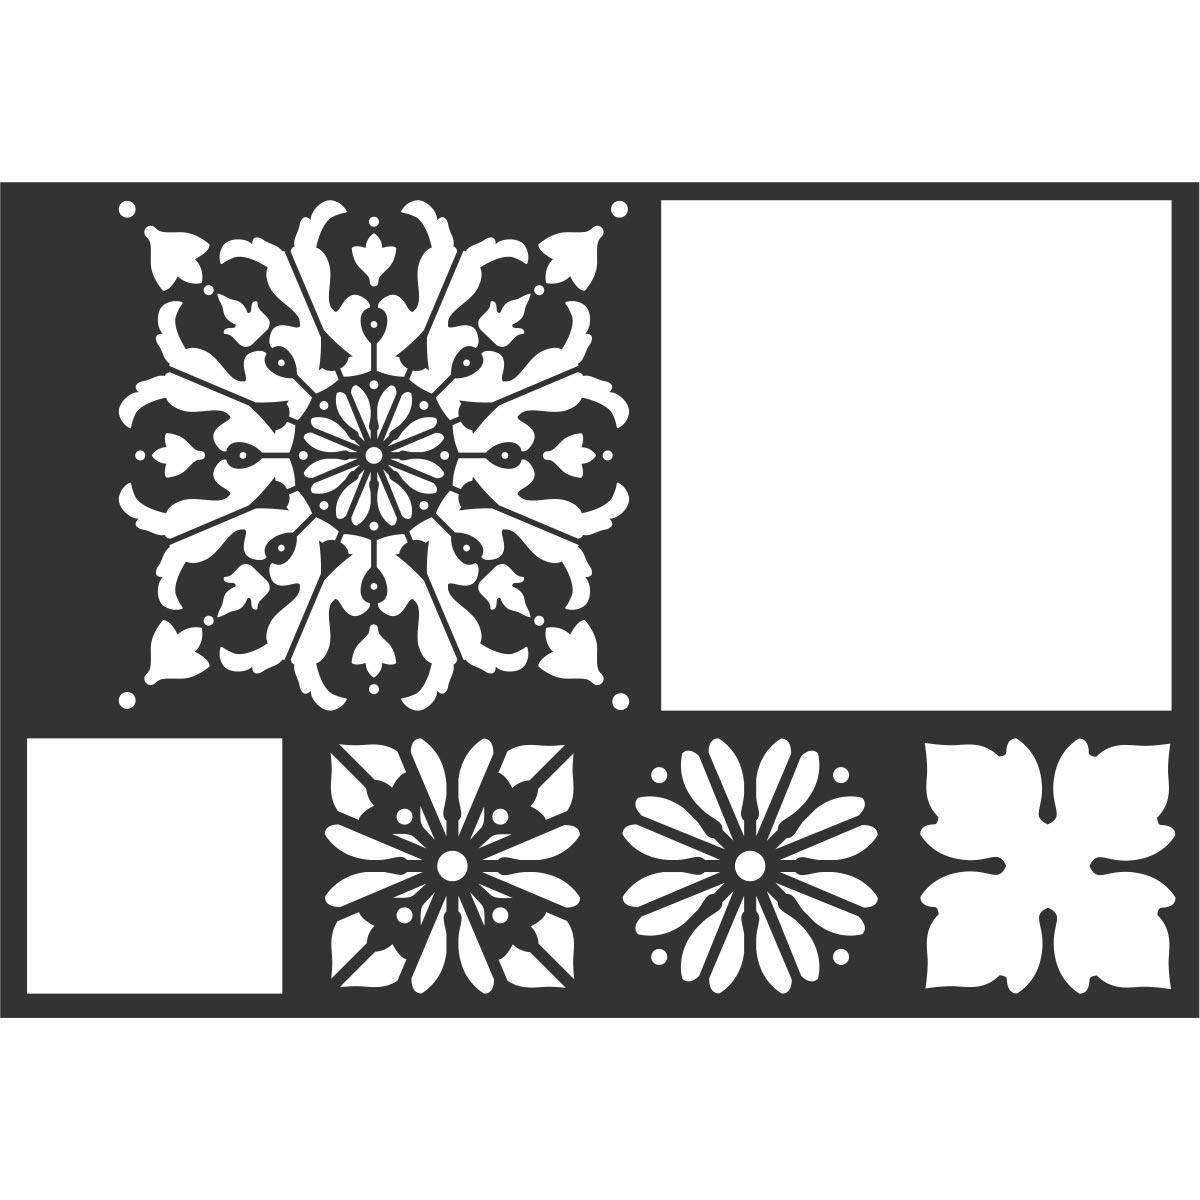 FolkArt ® Painting Stencils - Mod Flower Tile - 13236